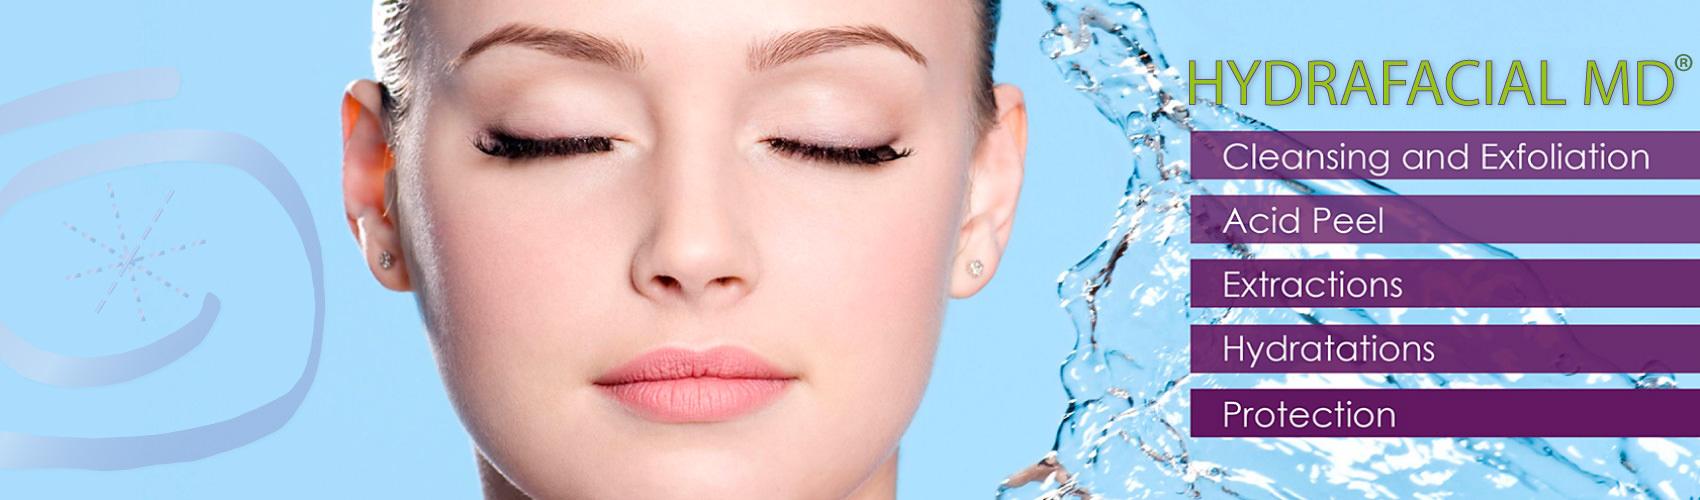 Laser Skin Center Amp Medical Spa Hydrafacial Md